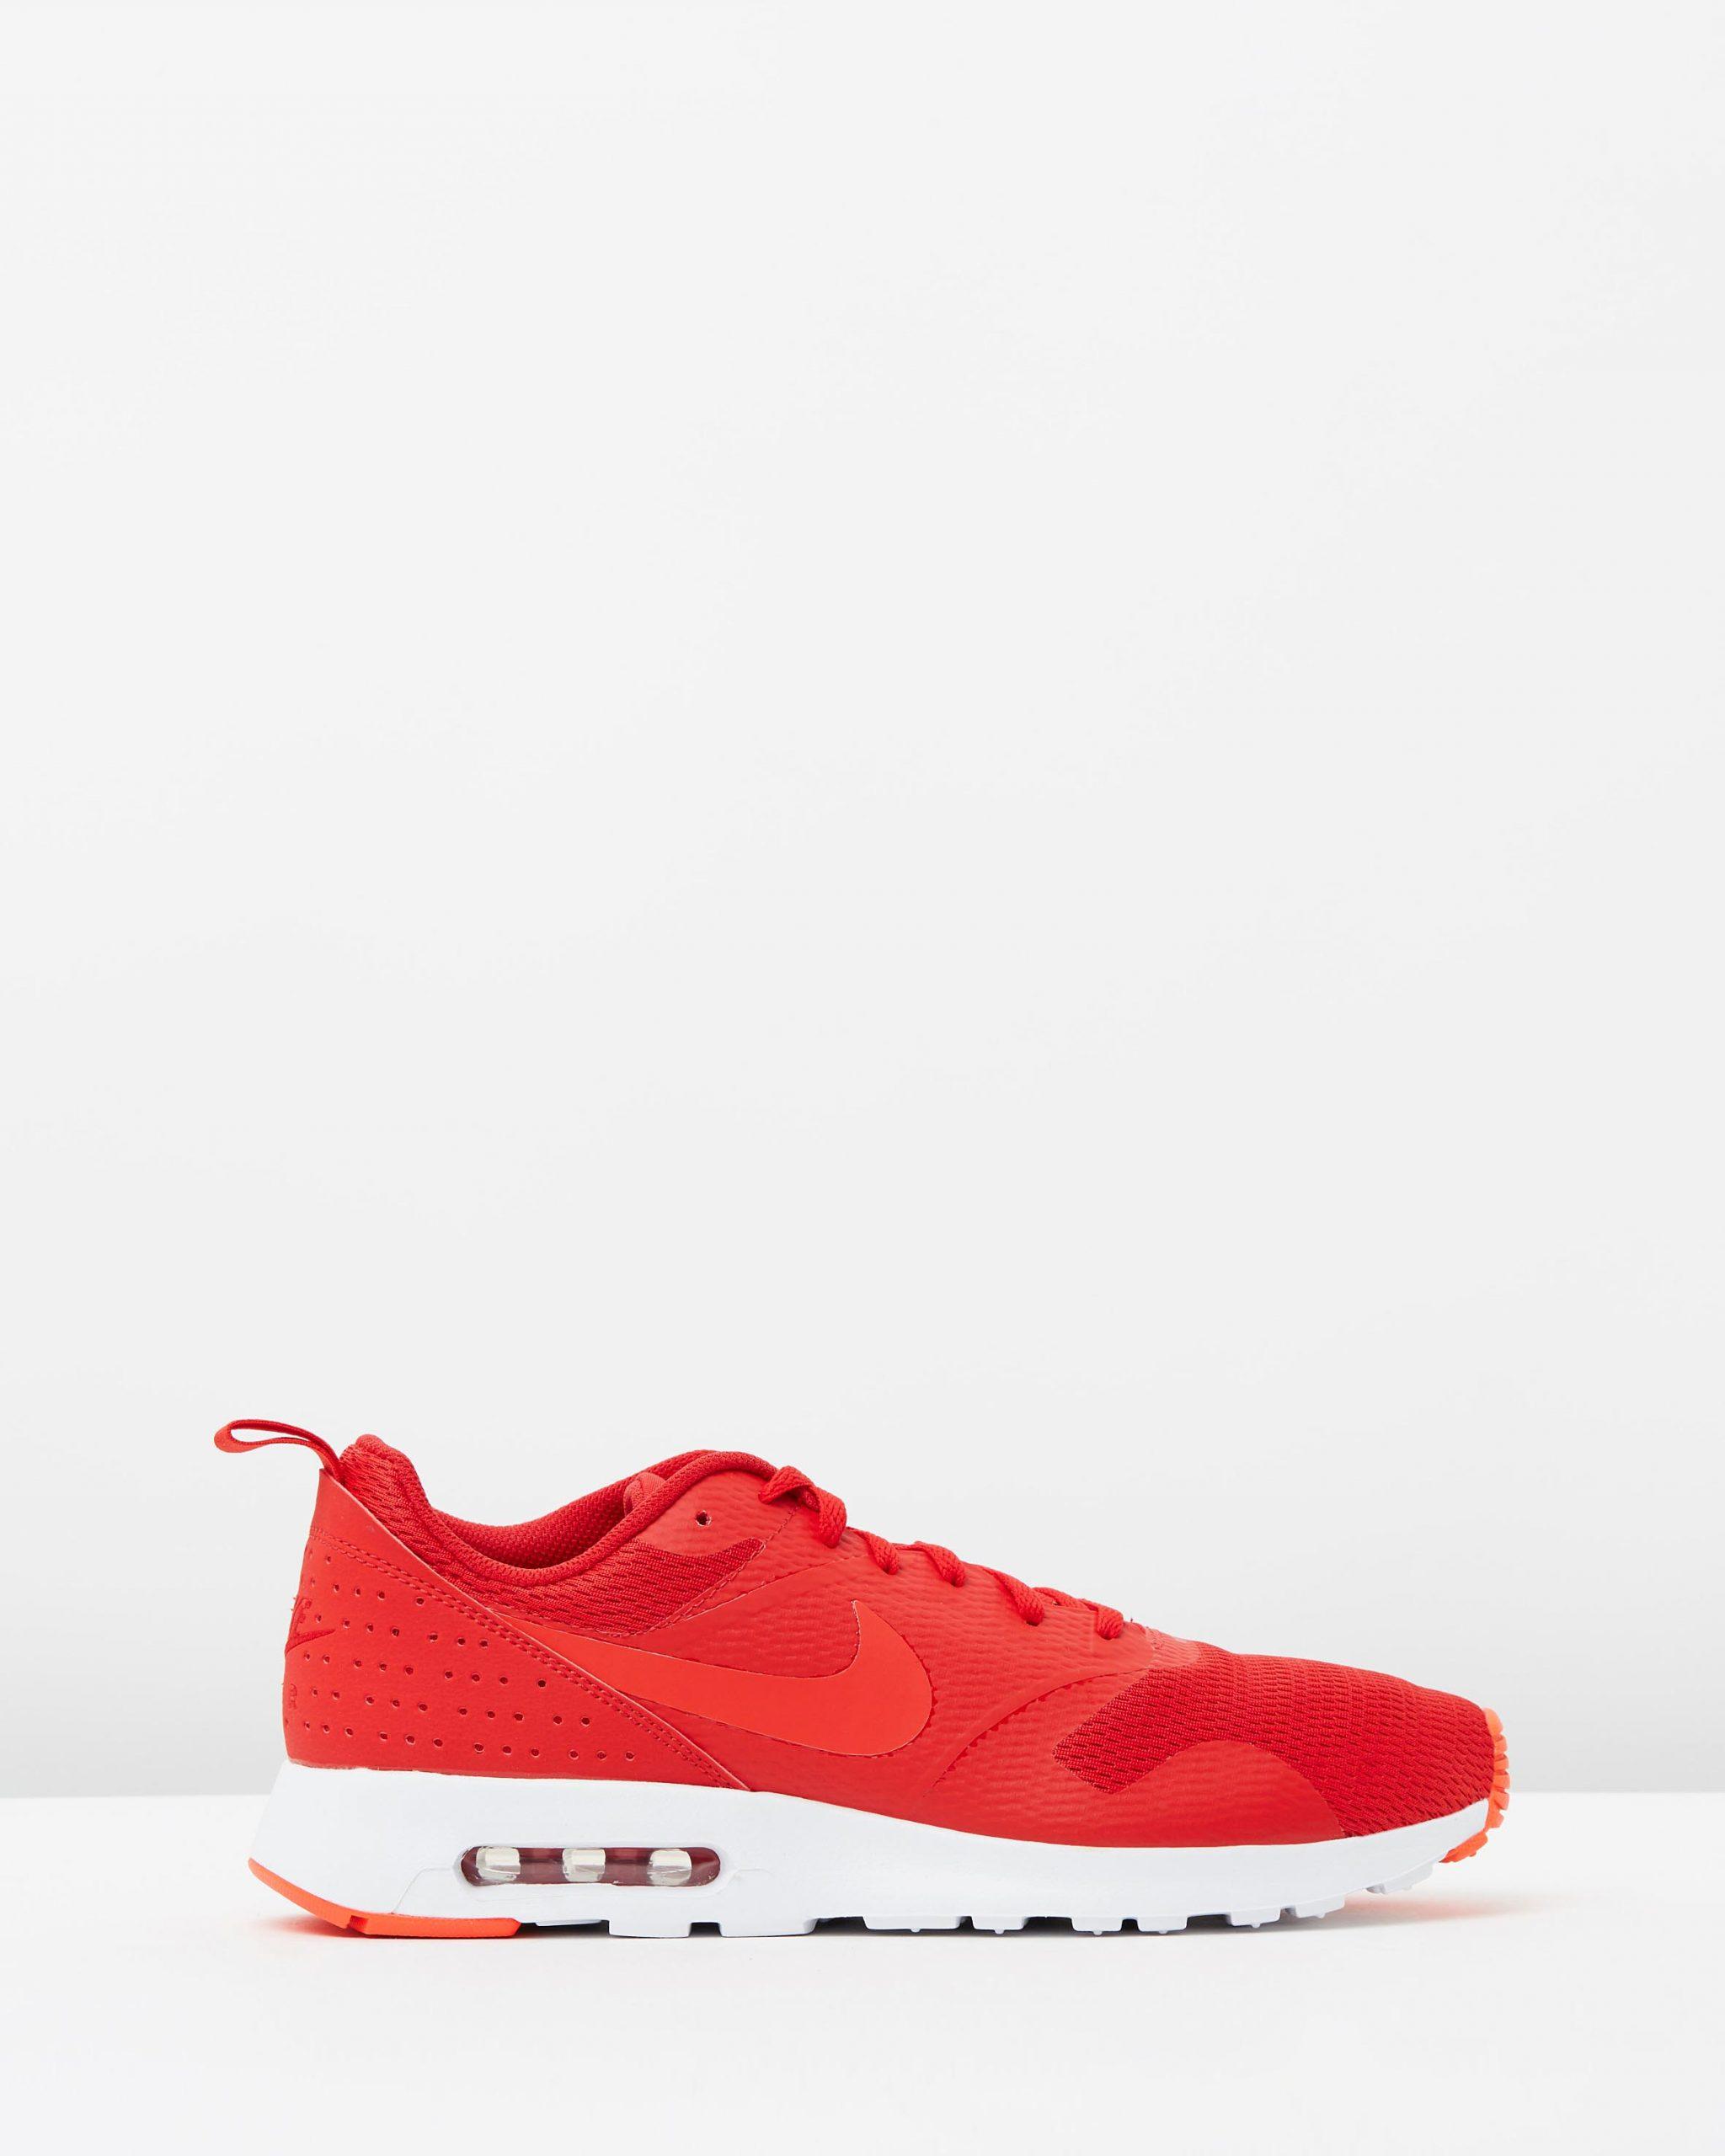 Nike Men's Air Max Tavas Leather University Red